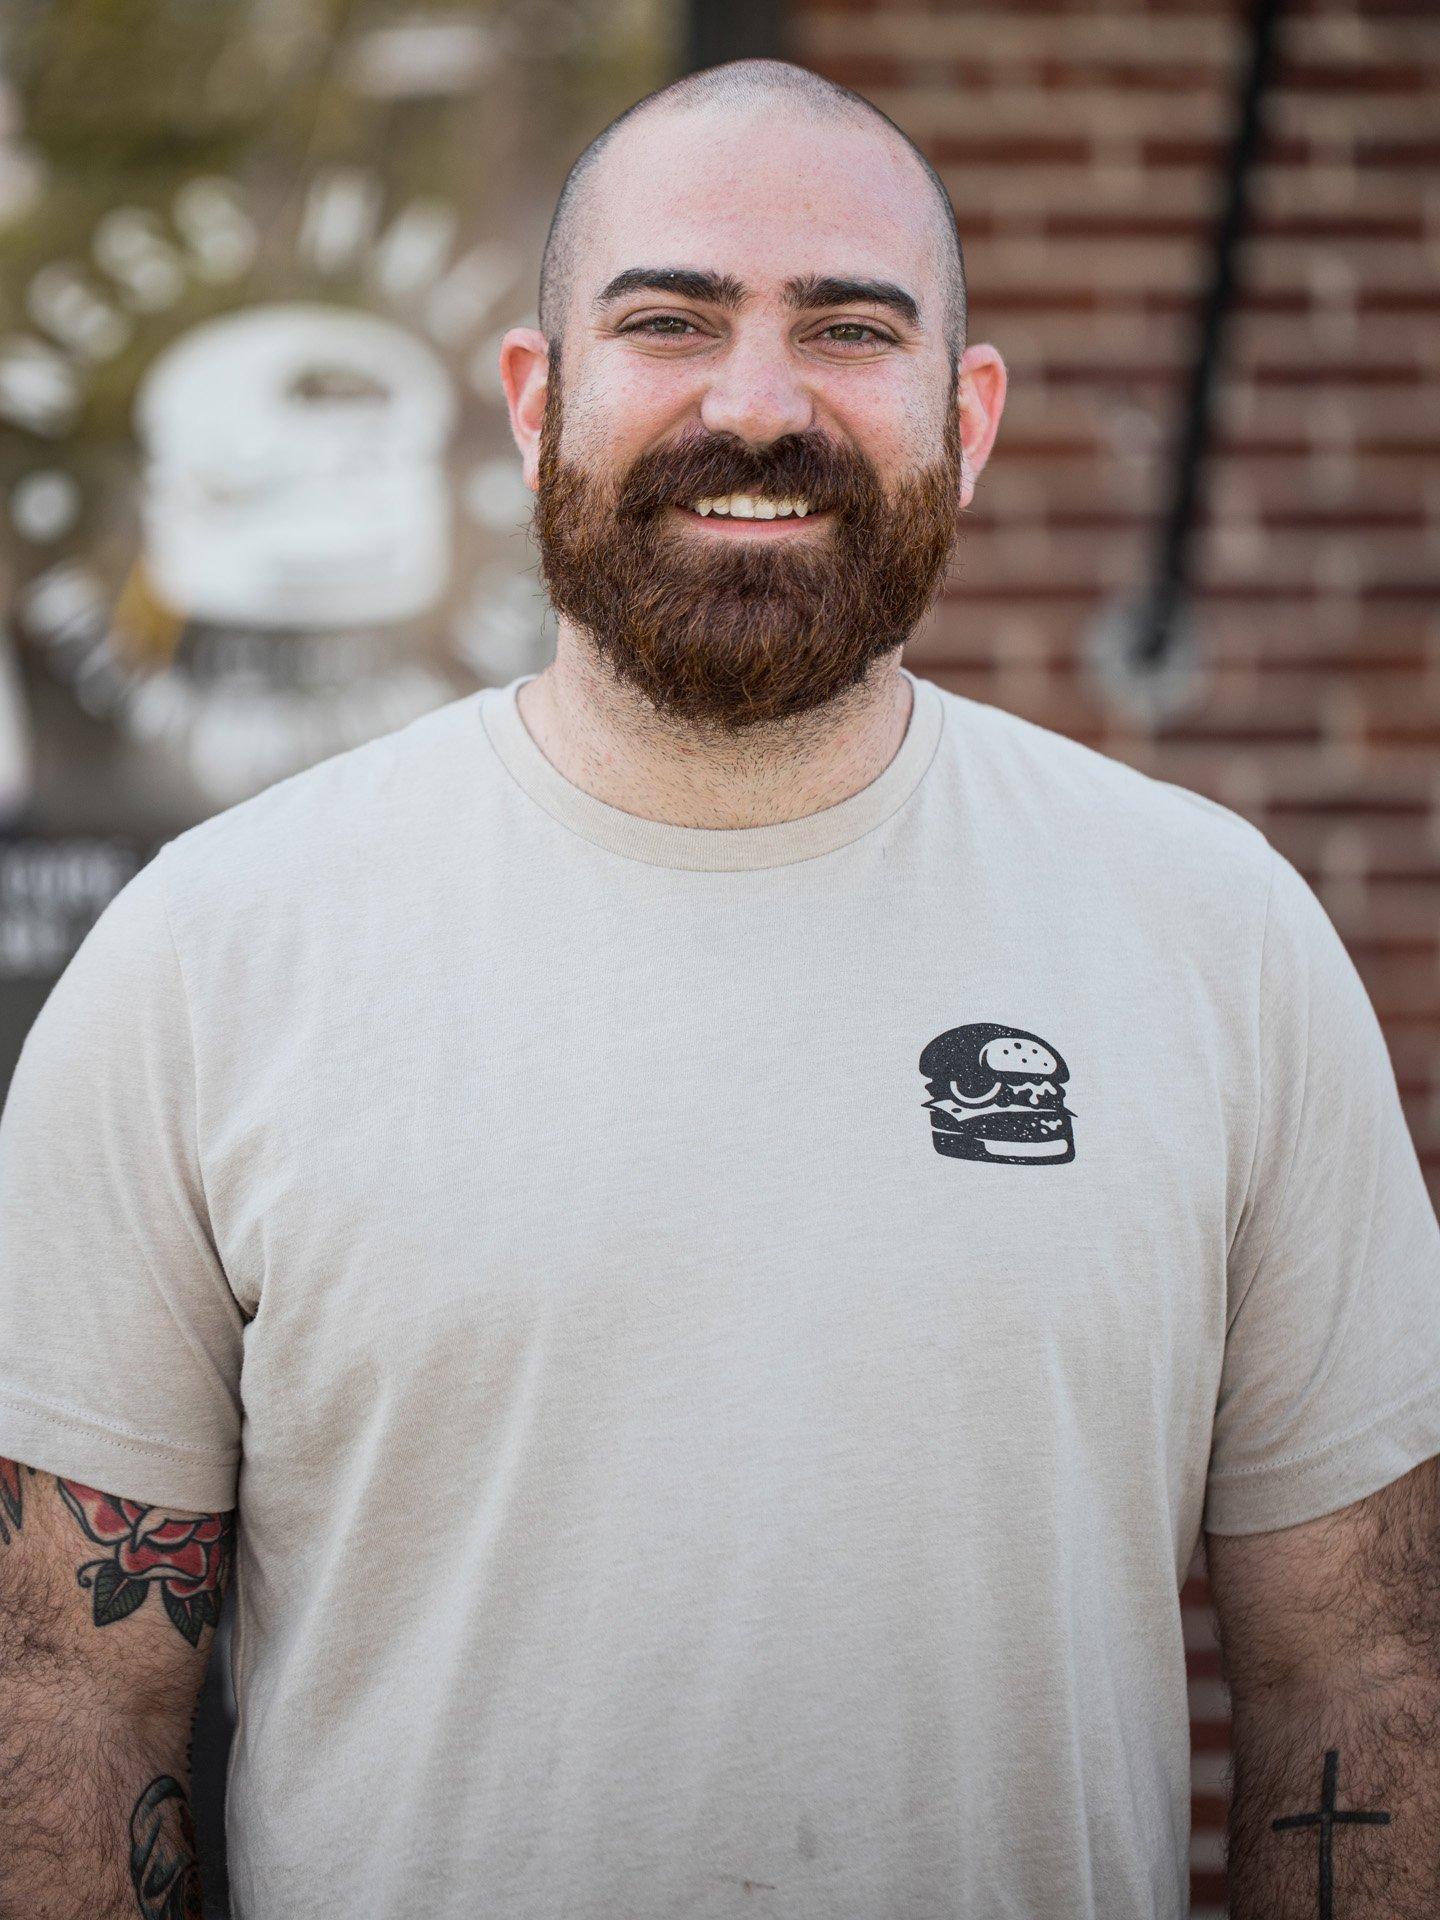 Sam Steger, Owner of Mess Hall